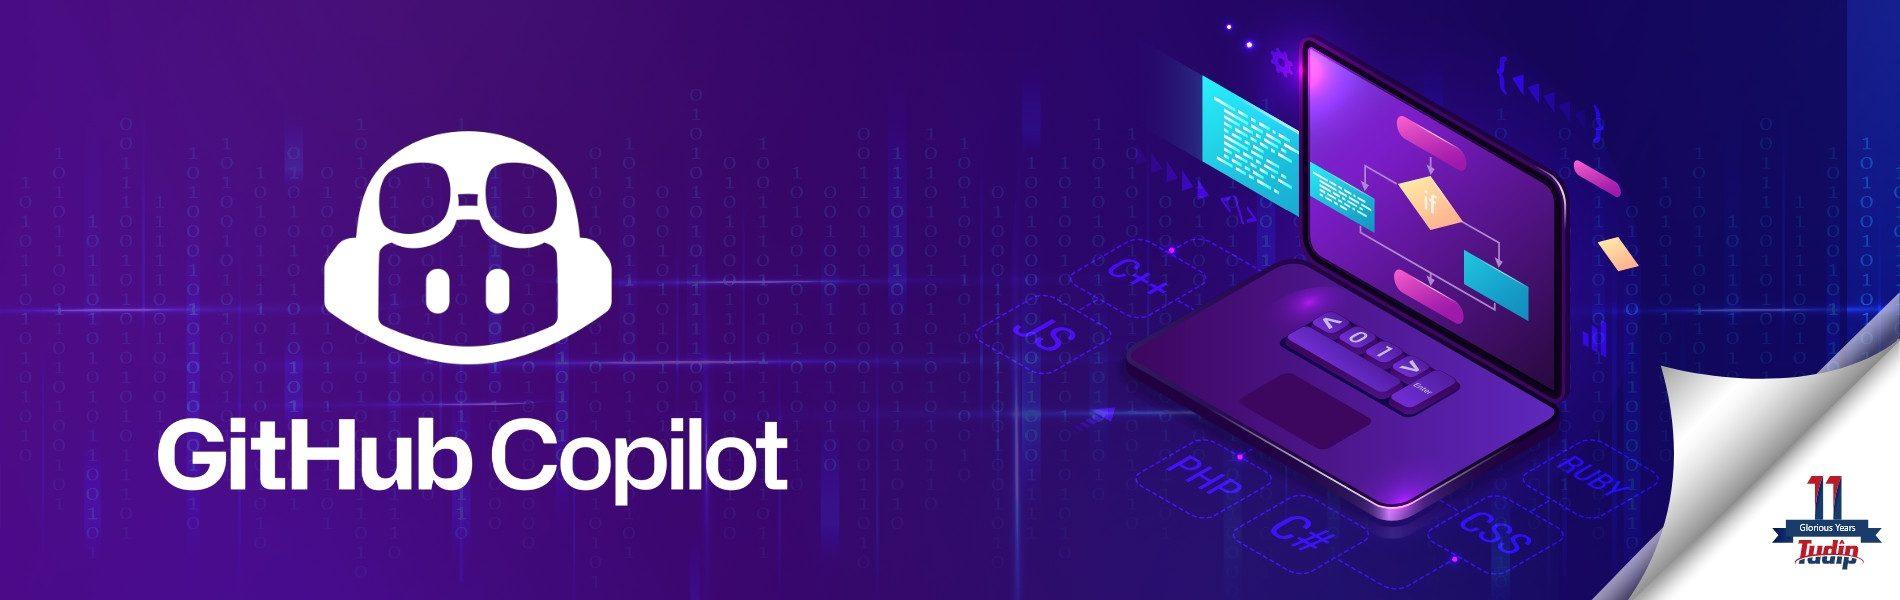 What is Github Copilot?